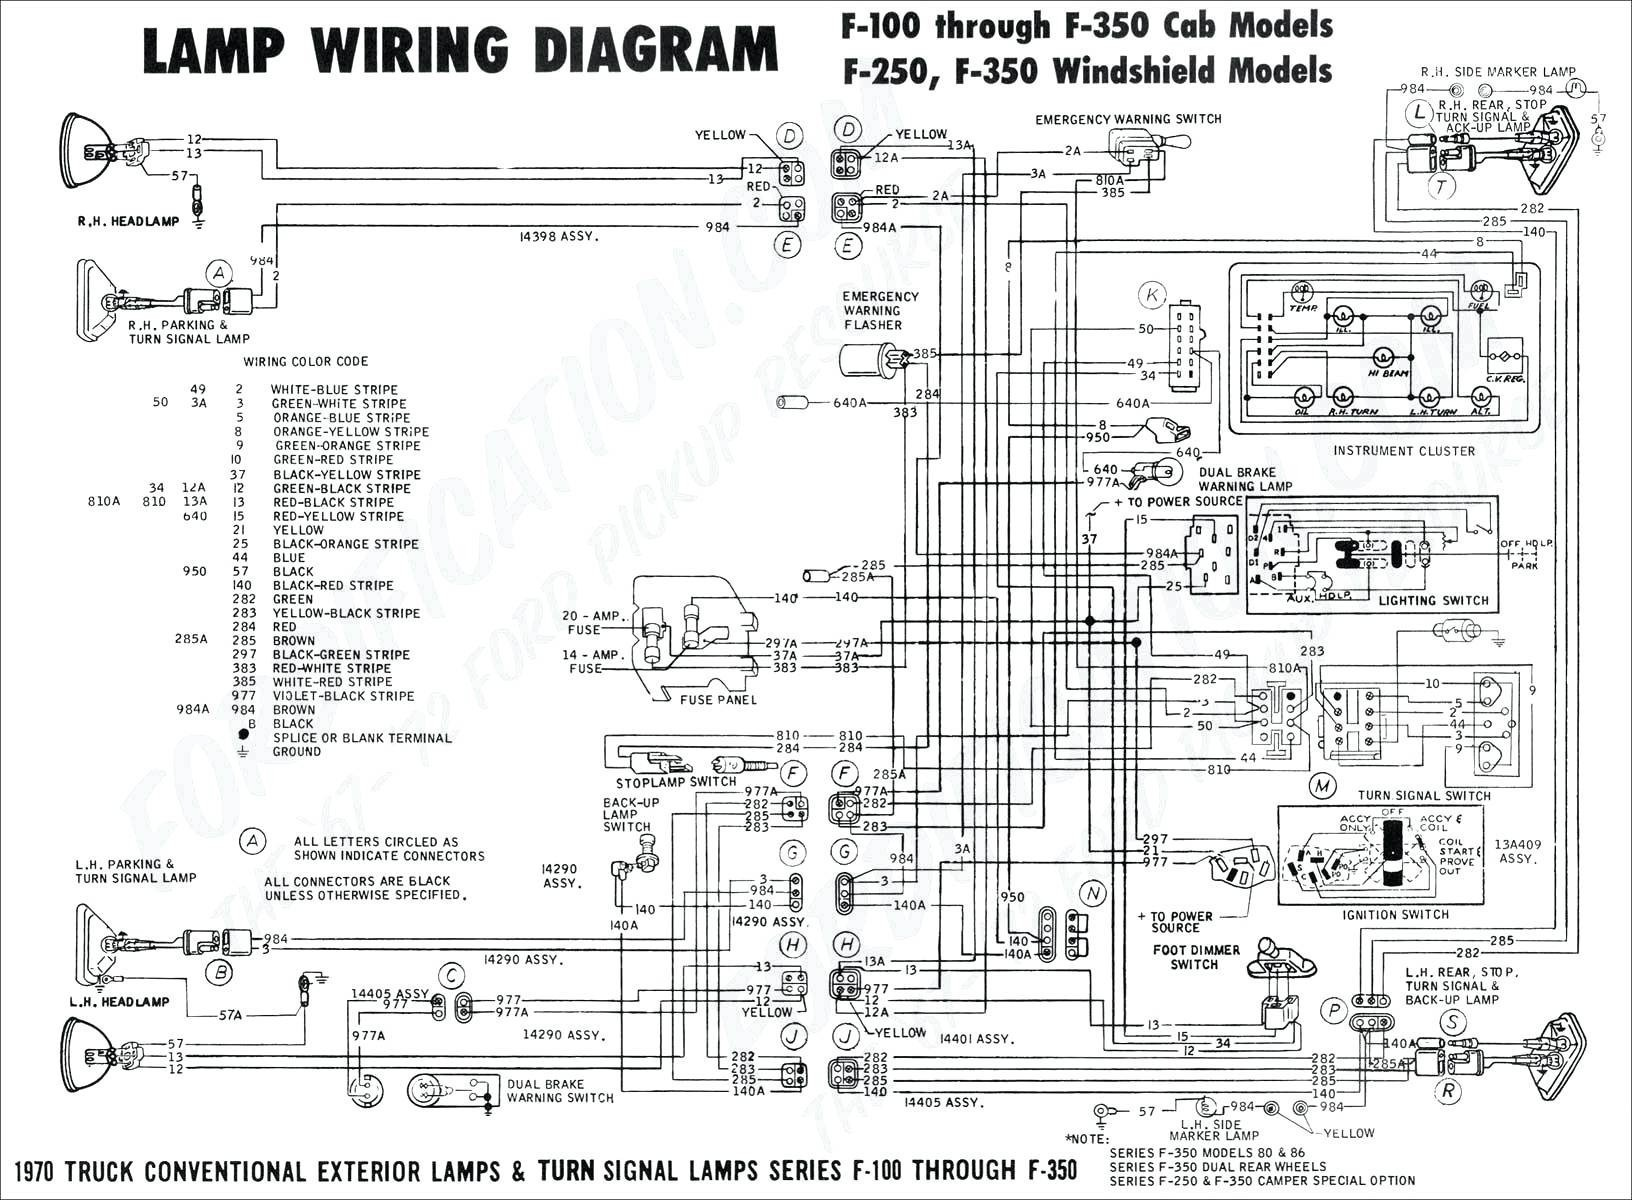 2012 Nissan Maxima Wiring Diagram